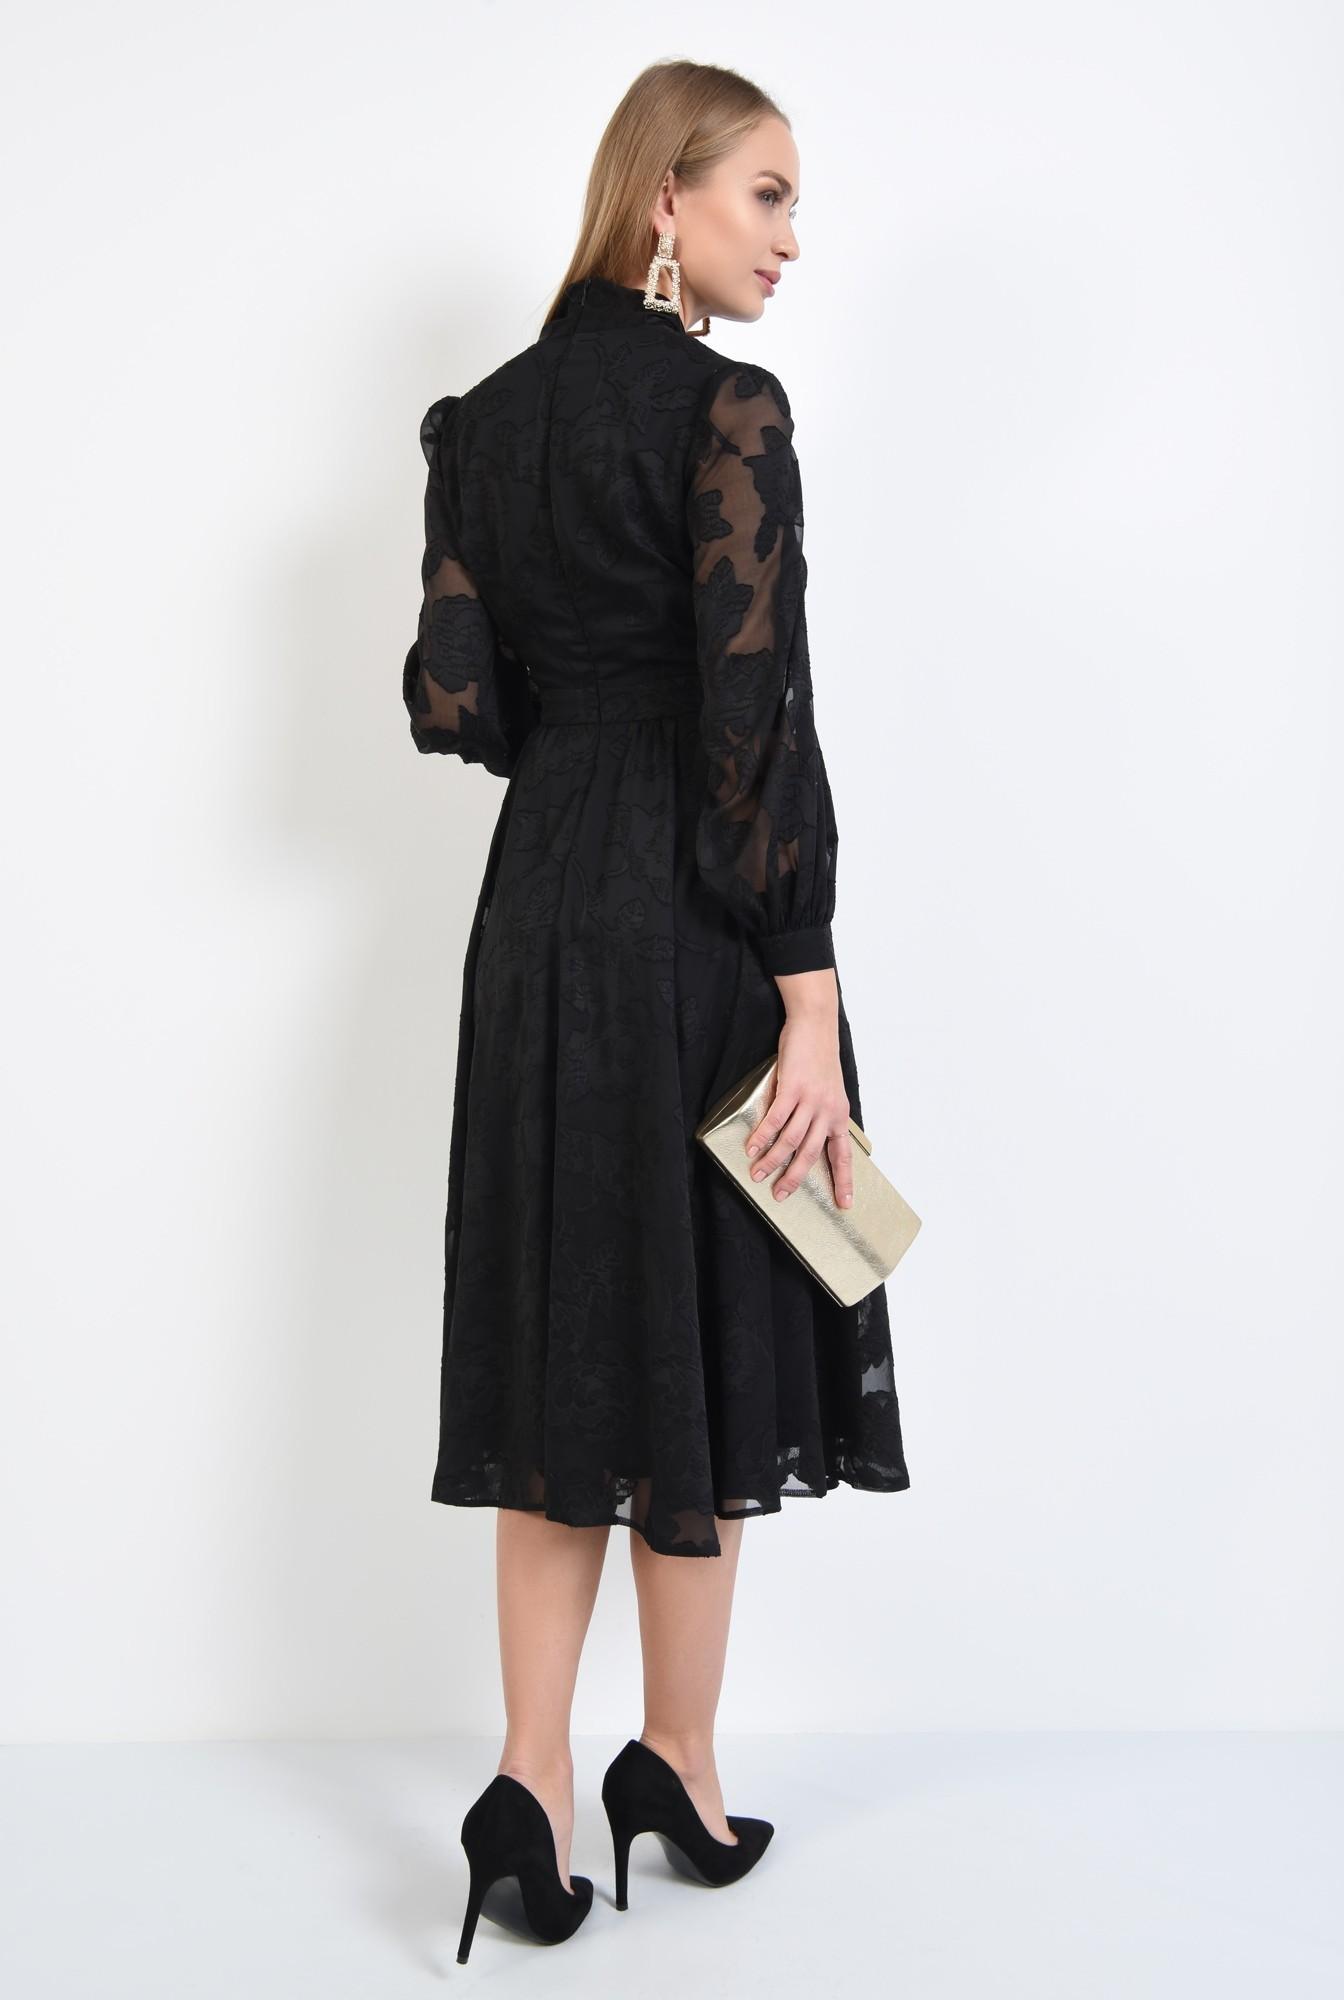 1 - 360 - rochie eleganta, clos, neagra, funda la gat, maneci transparente